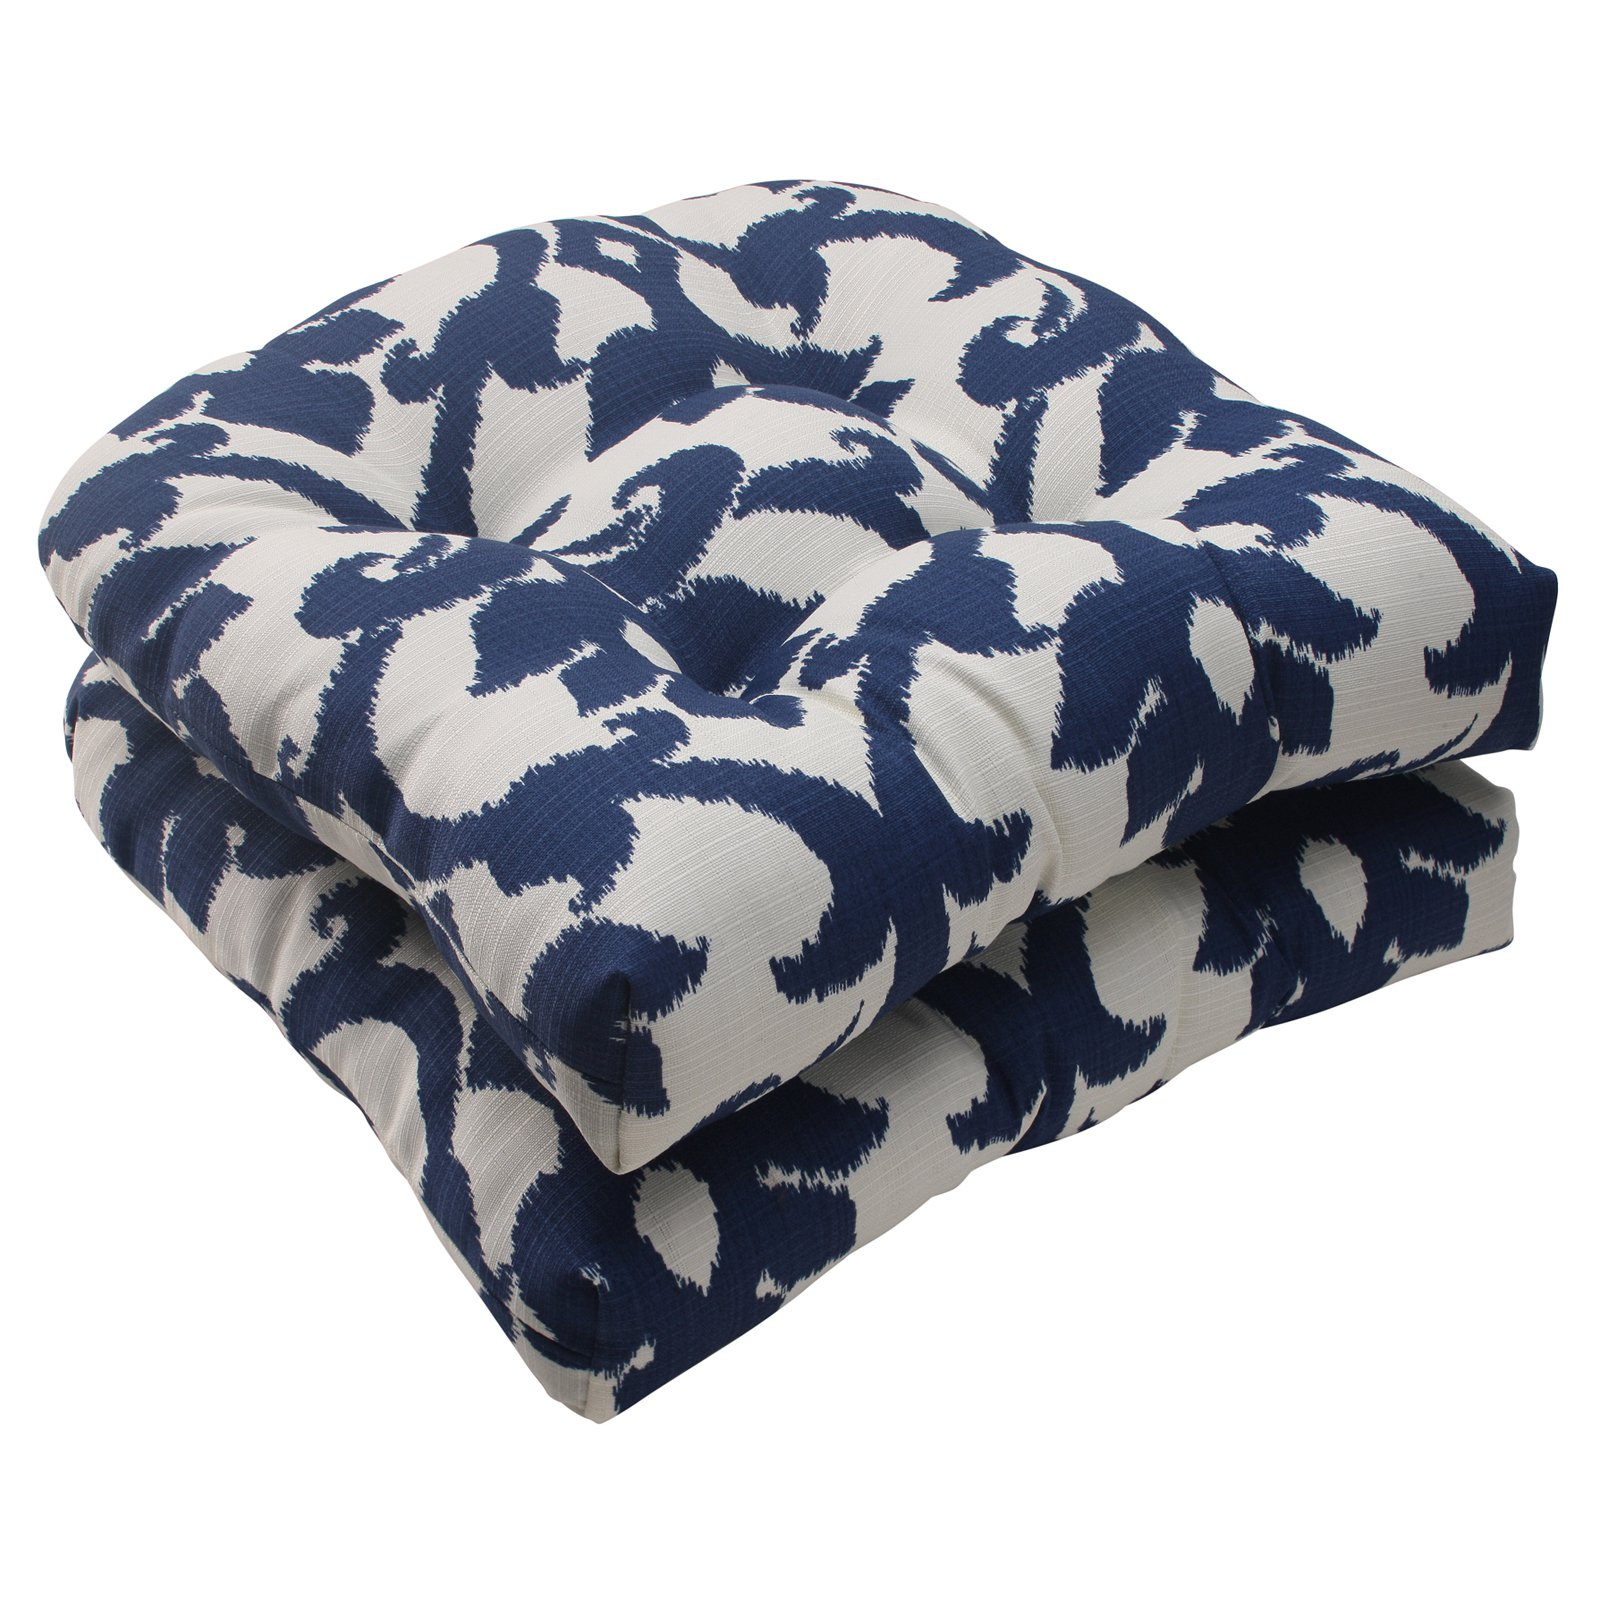 Pillow Perfect Outdoor/ Indoor Bosco Navy Wicker Seat Cushion (Set of 2)